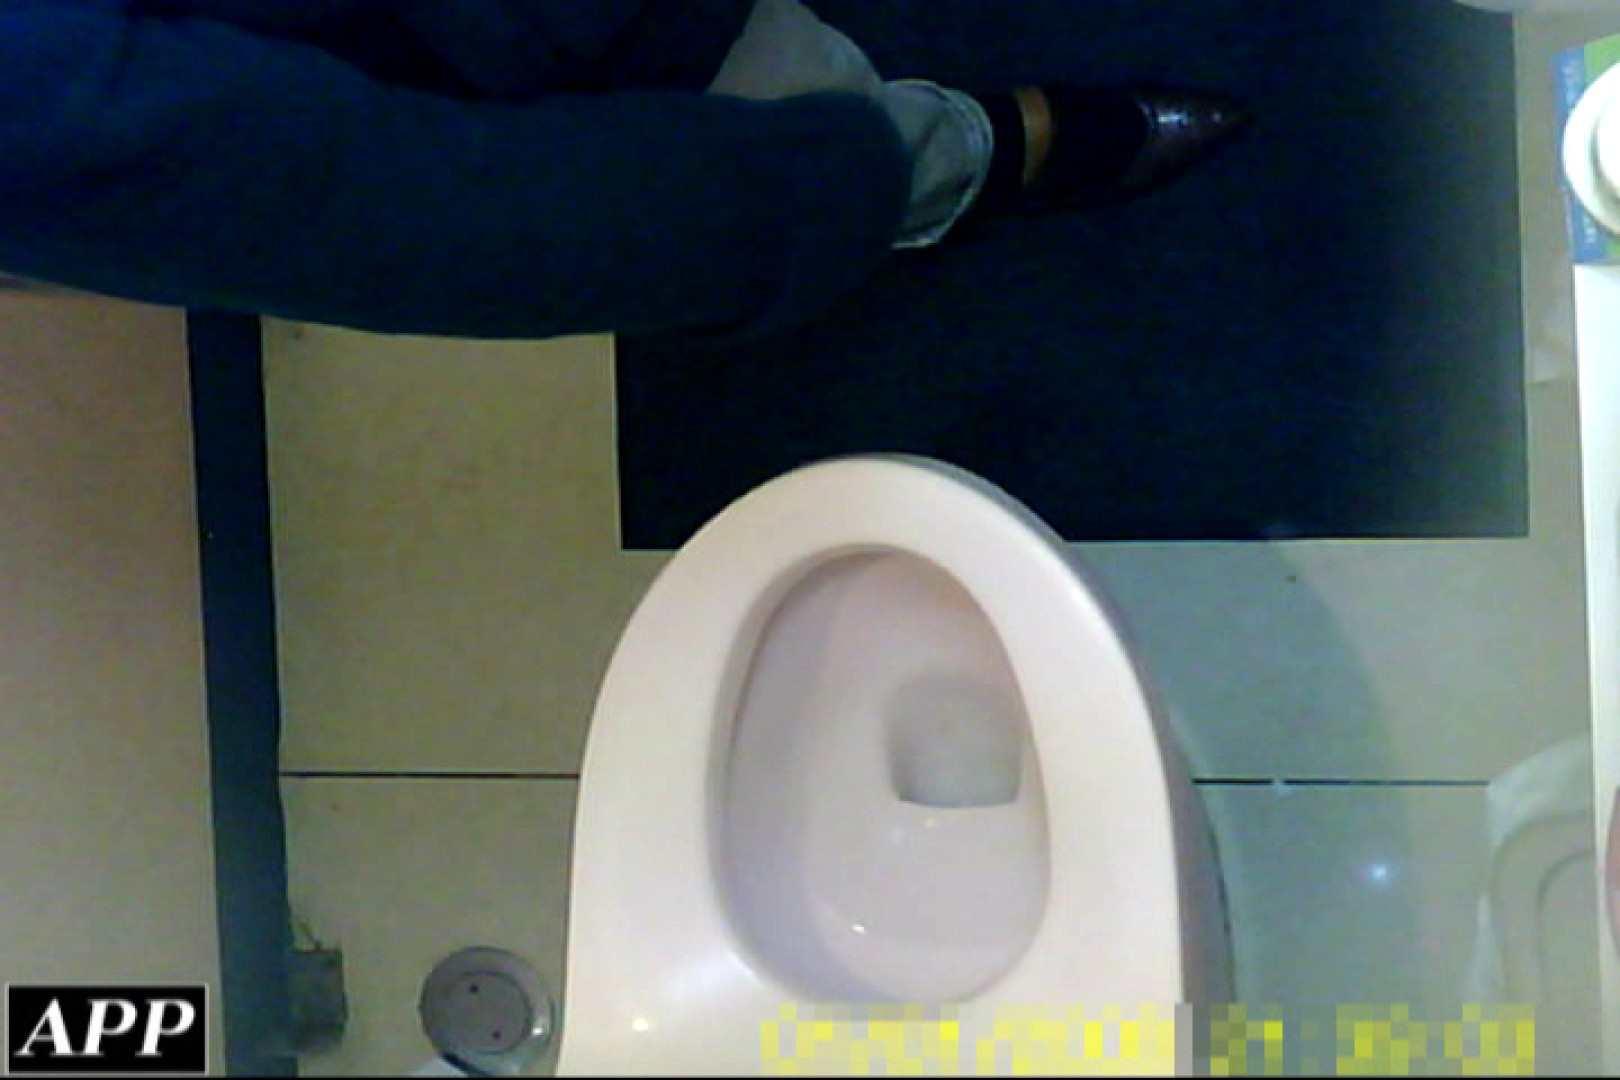 3視点洗面所 vol.087 OLエロ画像  83PICs 70